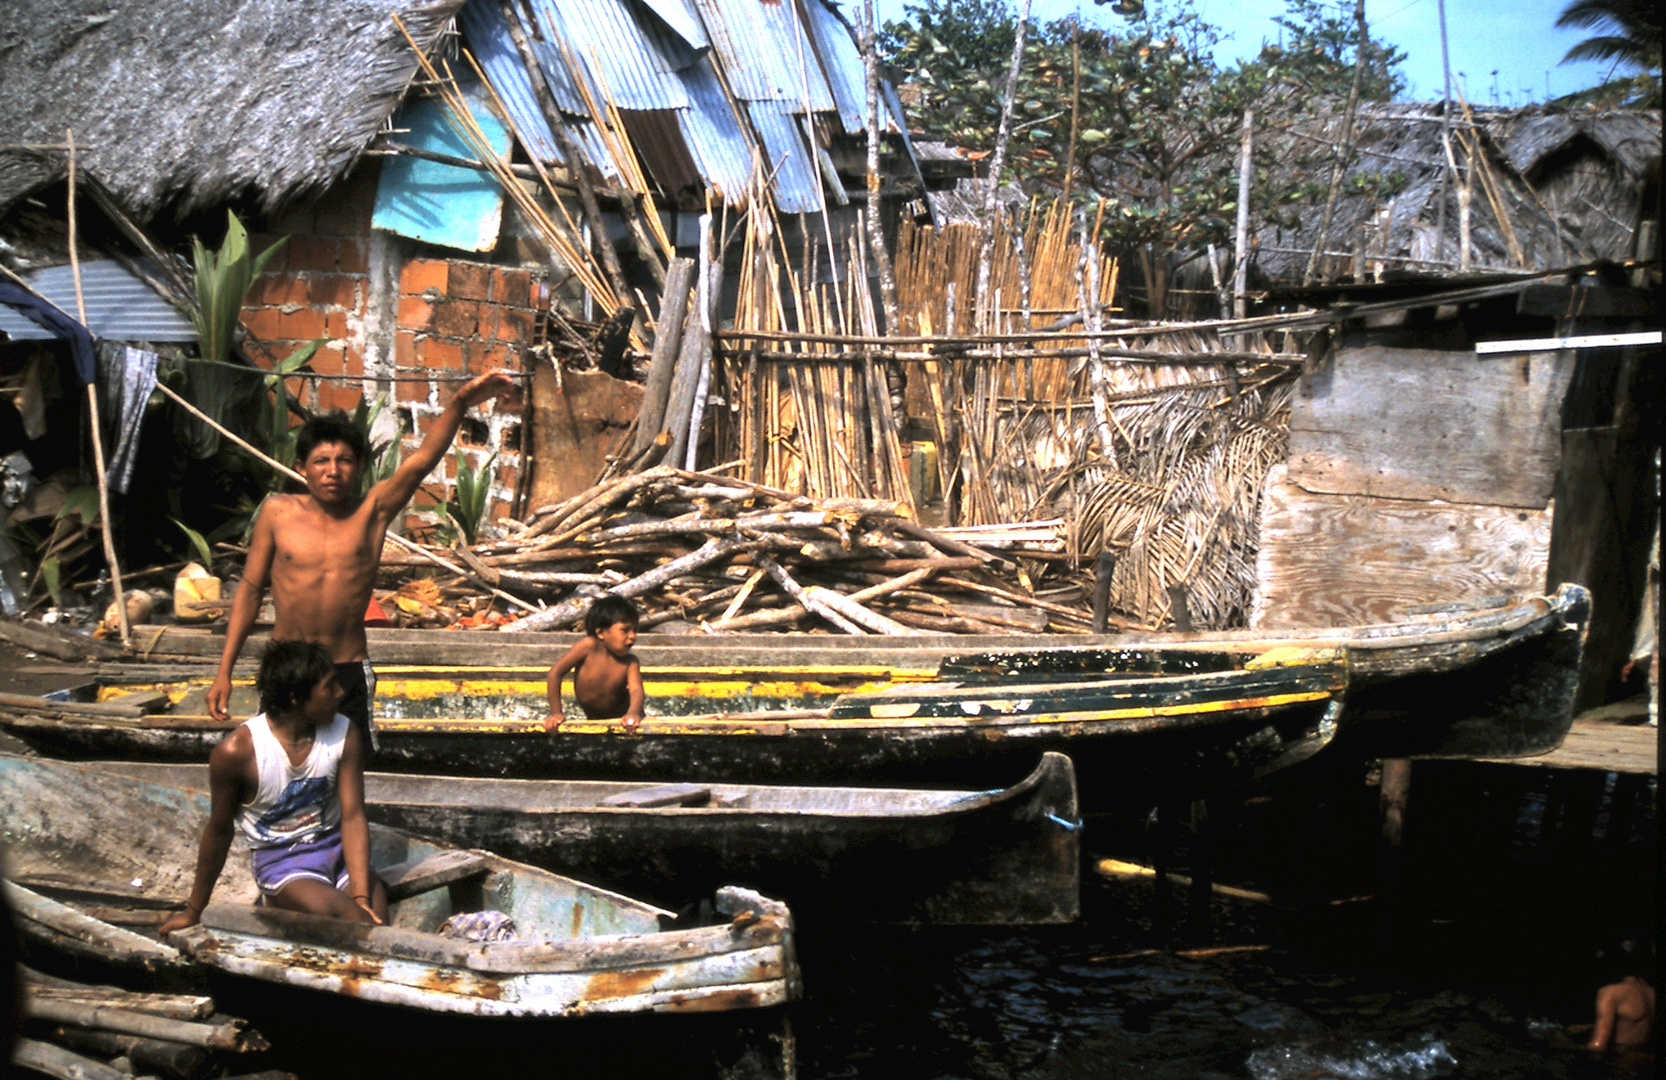 Cunas auf San Blasinseln